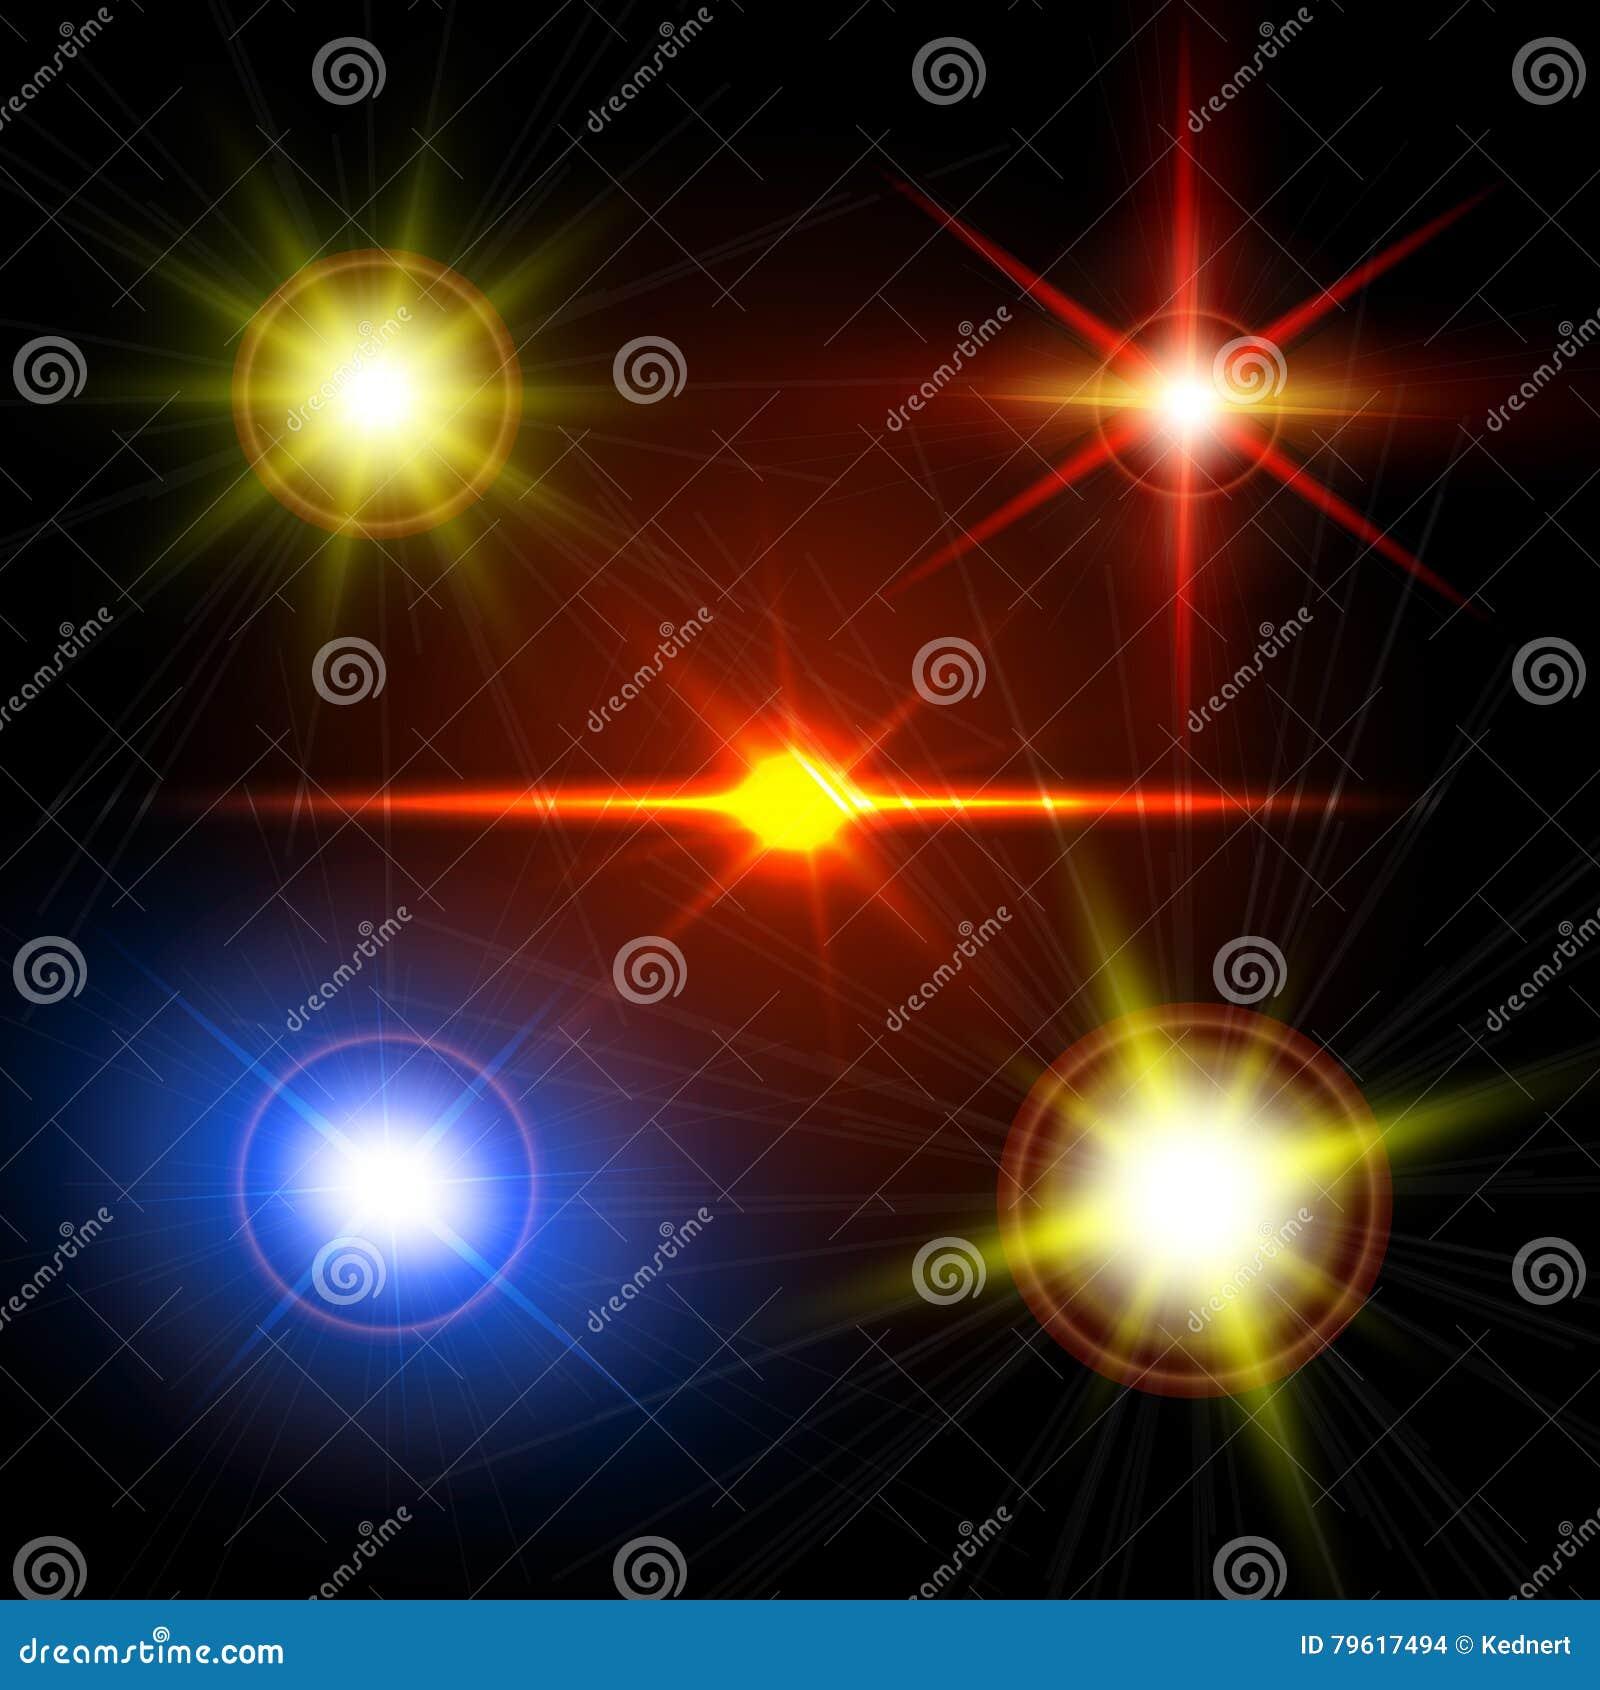 highlight lighting. Download Realistic Light Glare Sparkle, Highlight Set. Lighting Effects Of  Flash. Stock Vector Highlight Lighting E